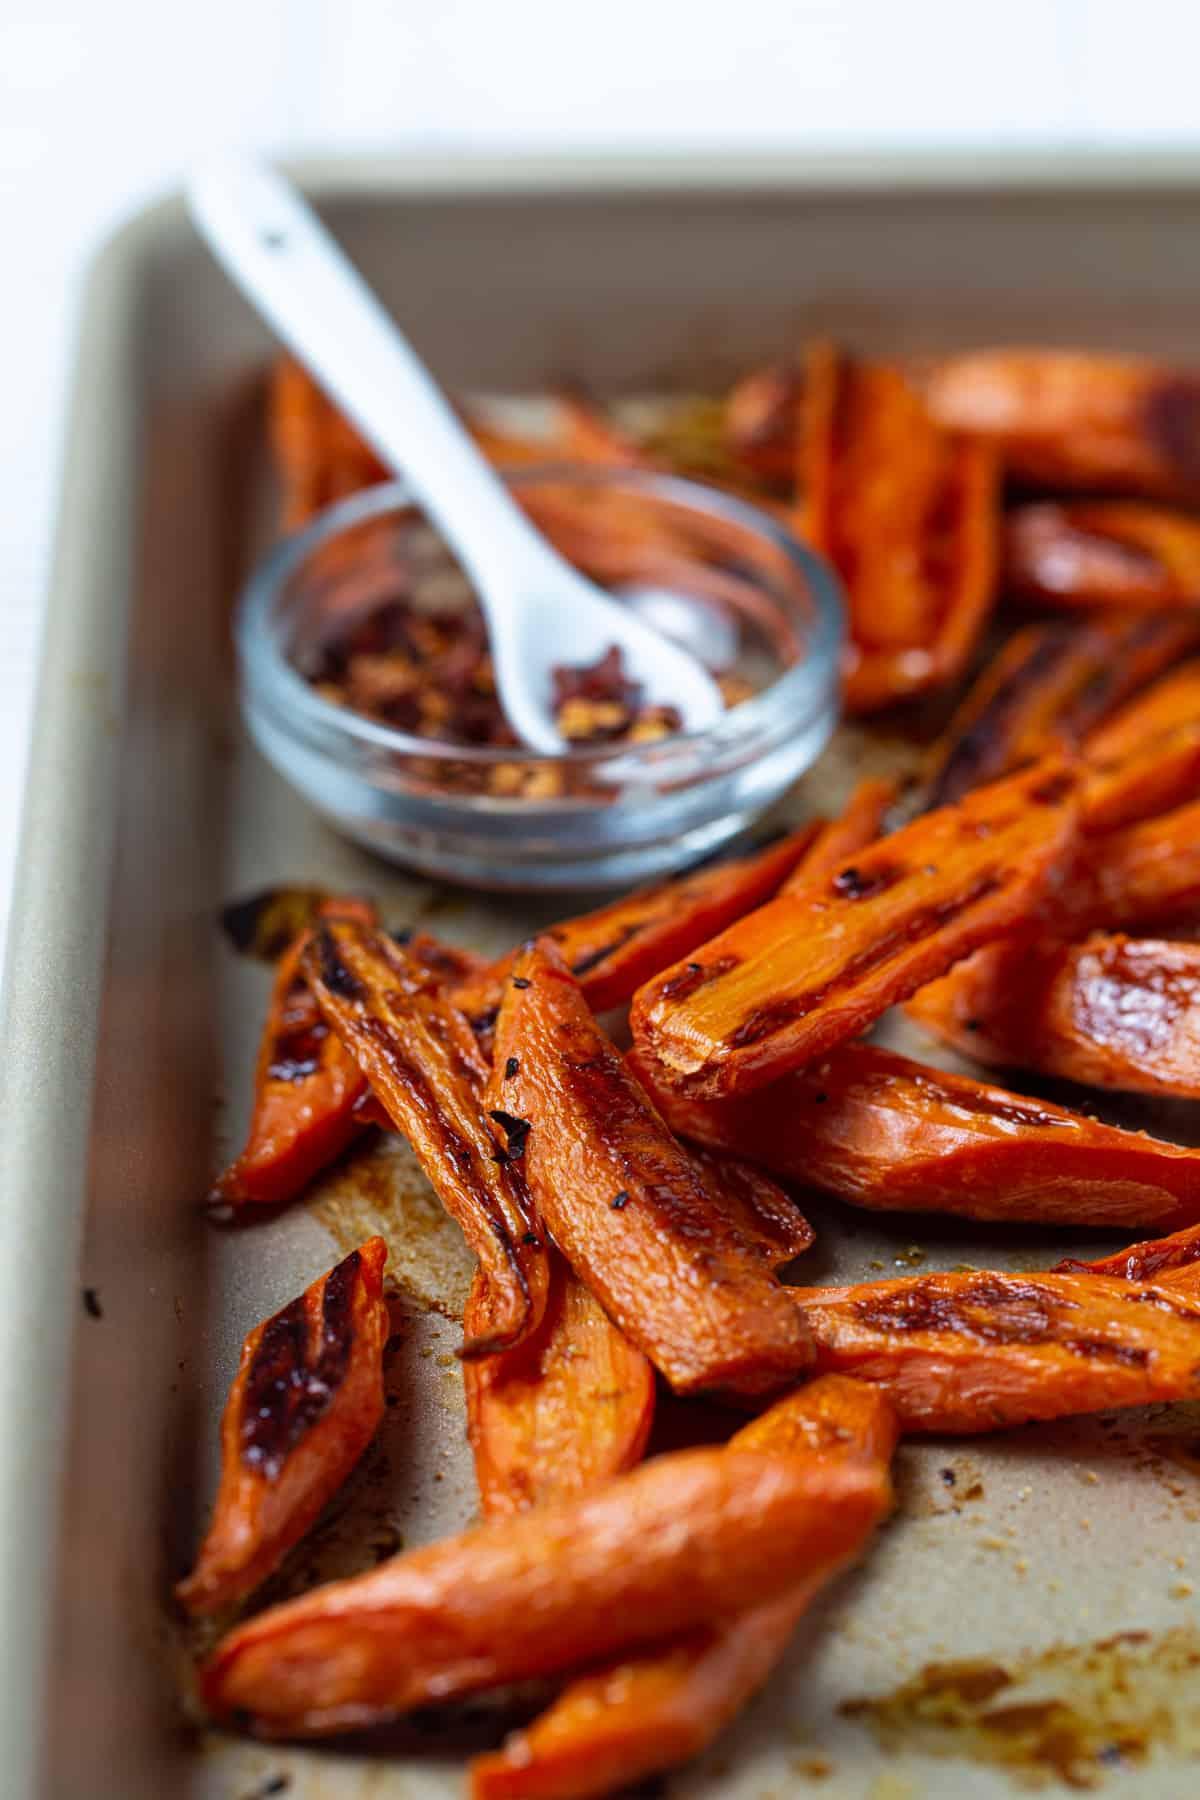 Roasted carrots on a sheet pan.